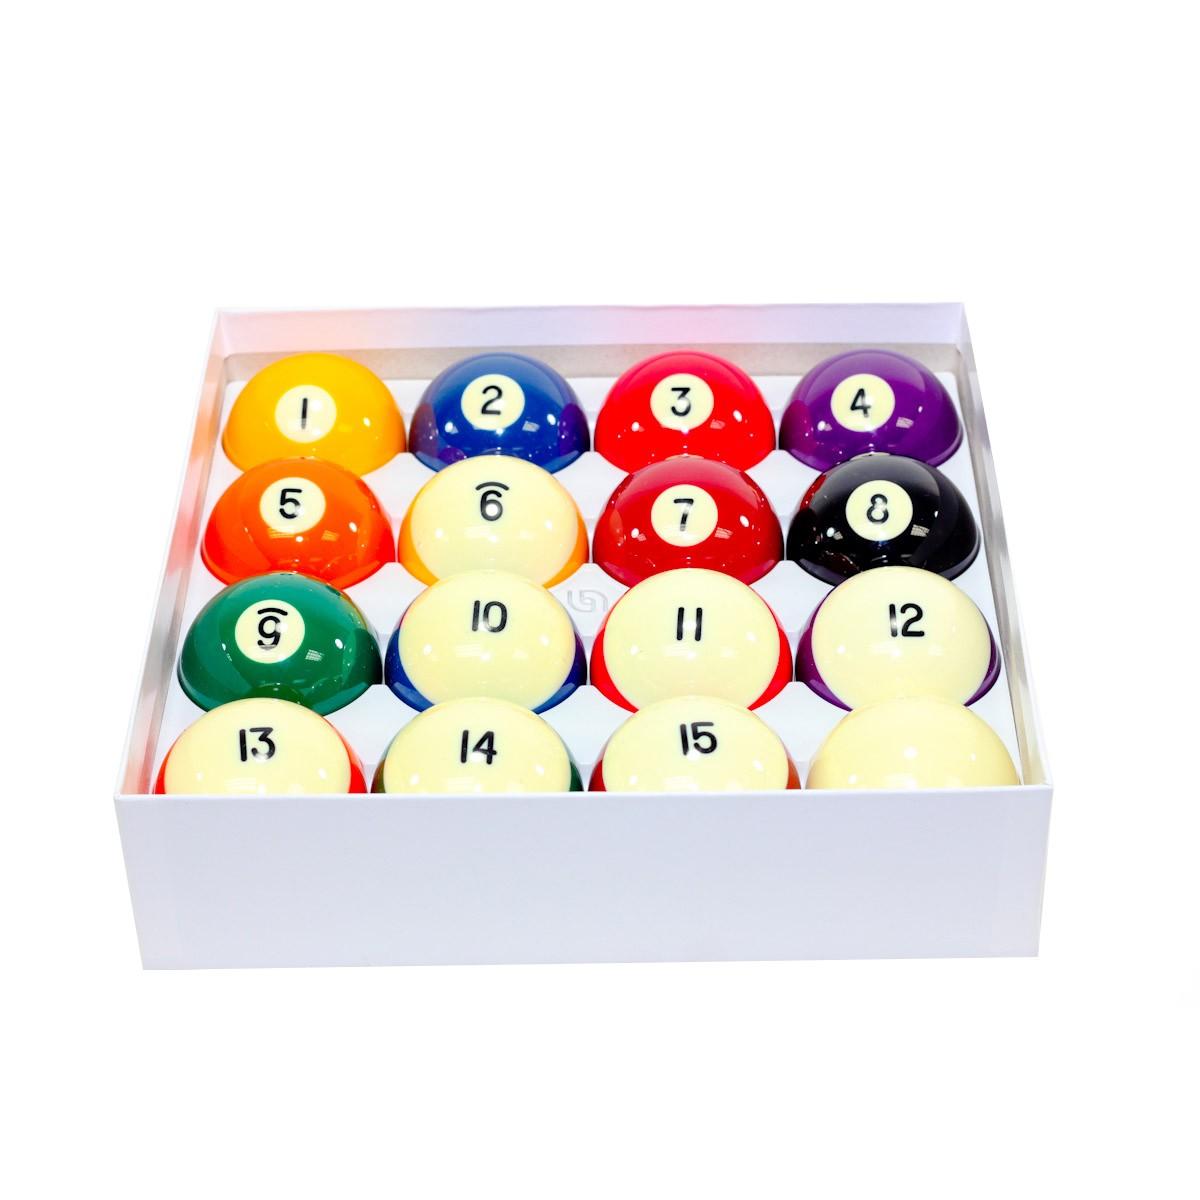 2 25 Quot Aramith Crown Standard Pool Ball Set